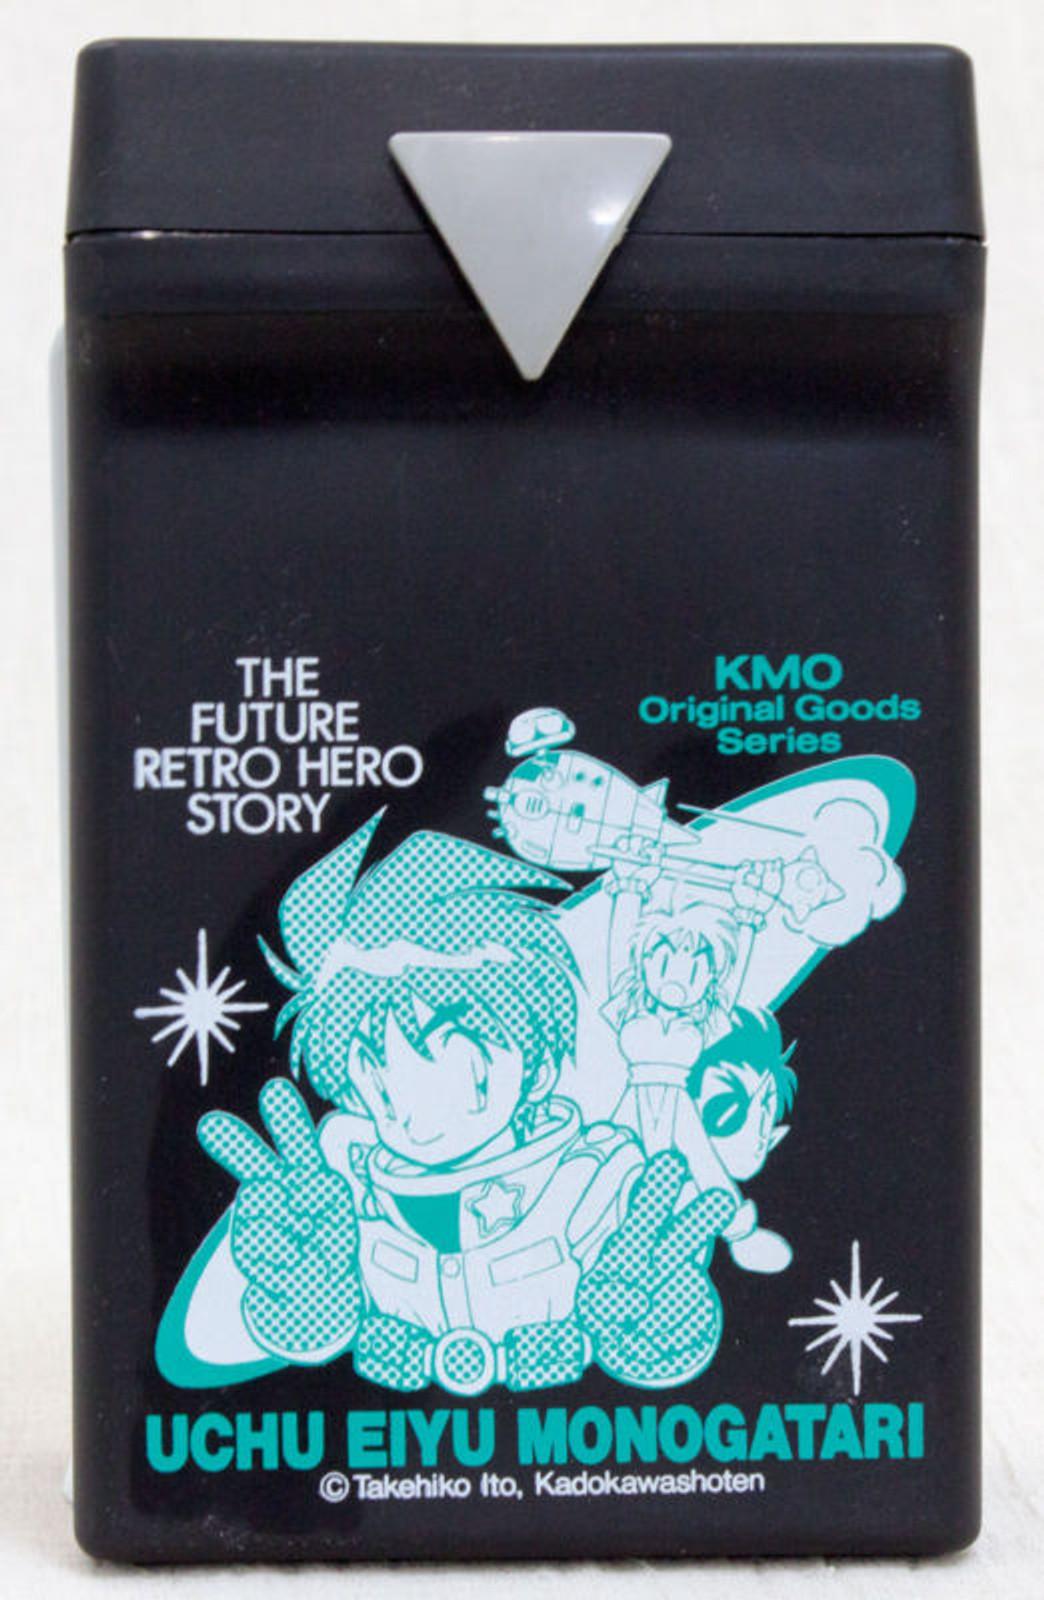 Future Retro Hero Story Pen set KMO Original Goods Series JAPAN ANIME MANGA